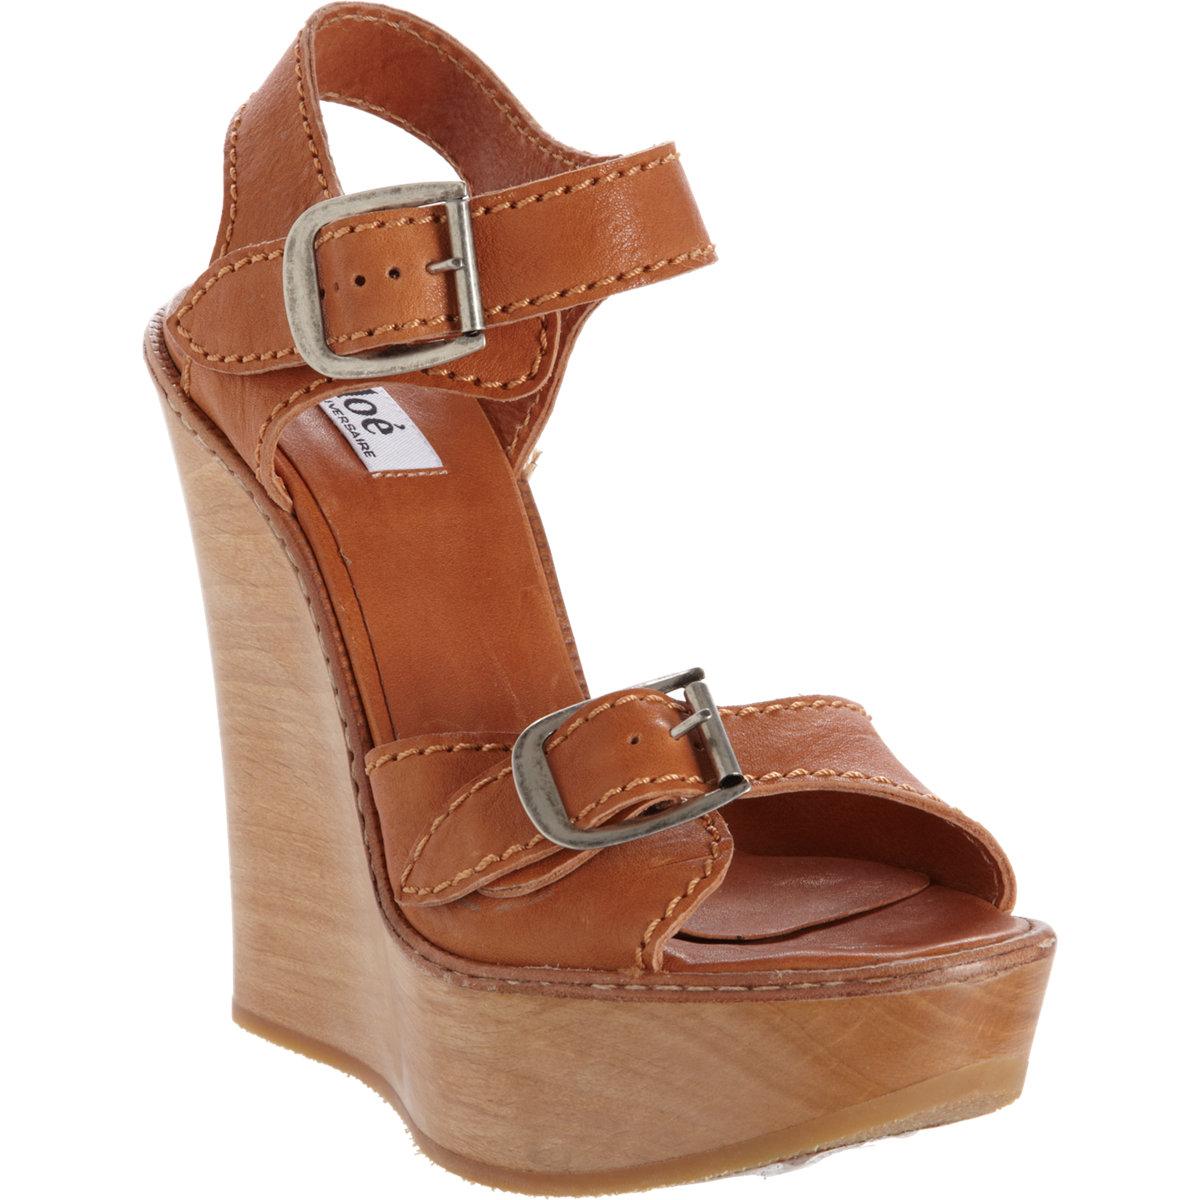 Chloé buckle strap wedge sandal at barneys.com